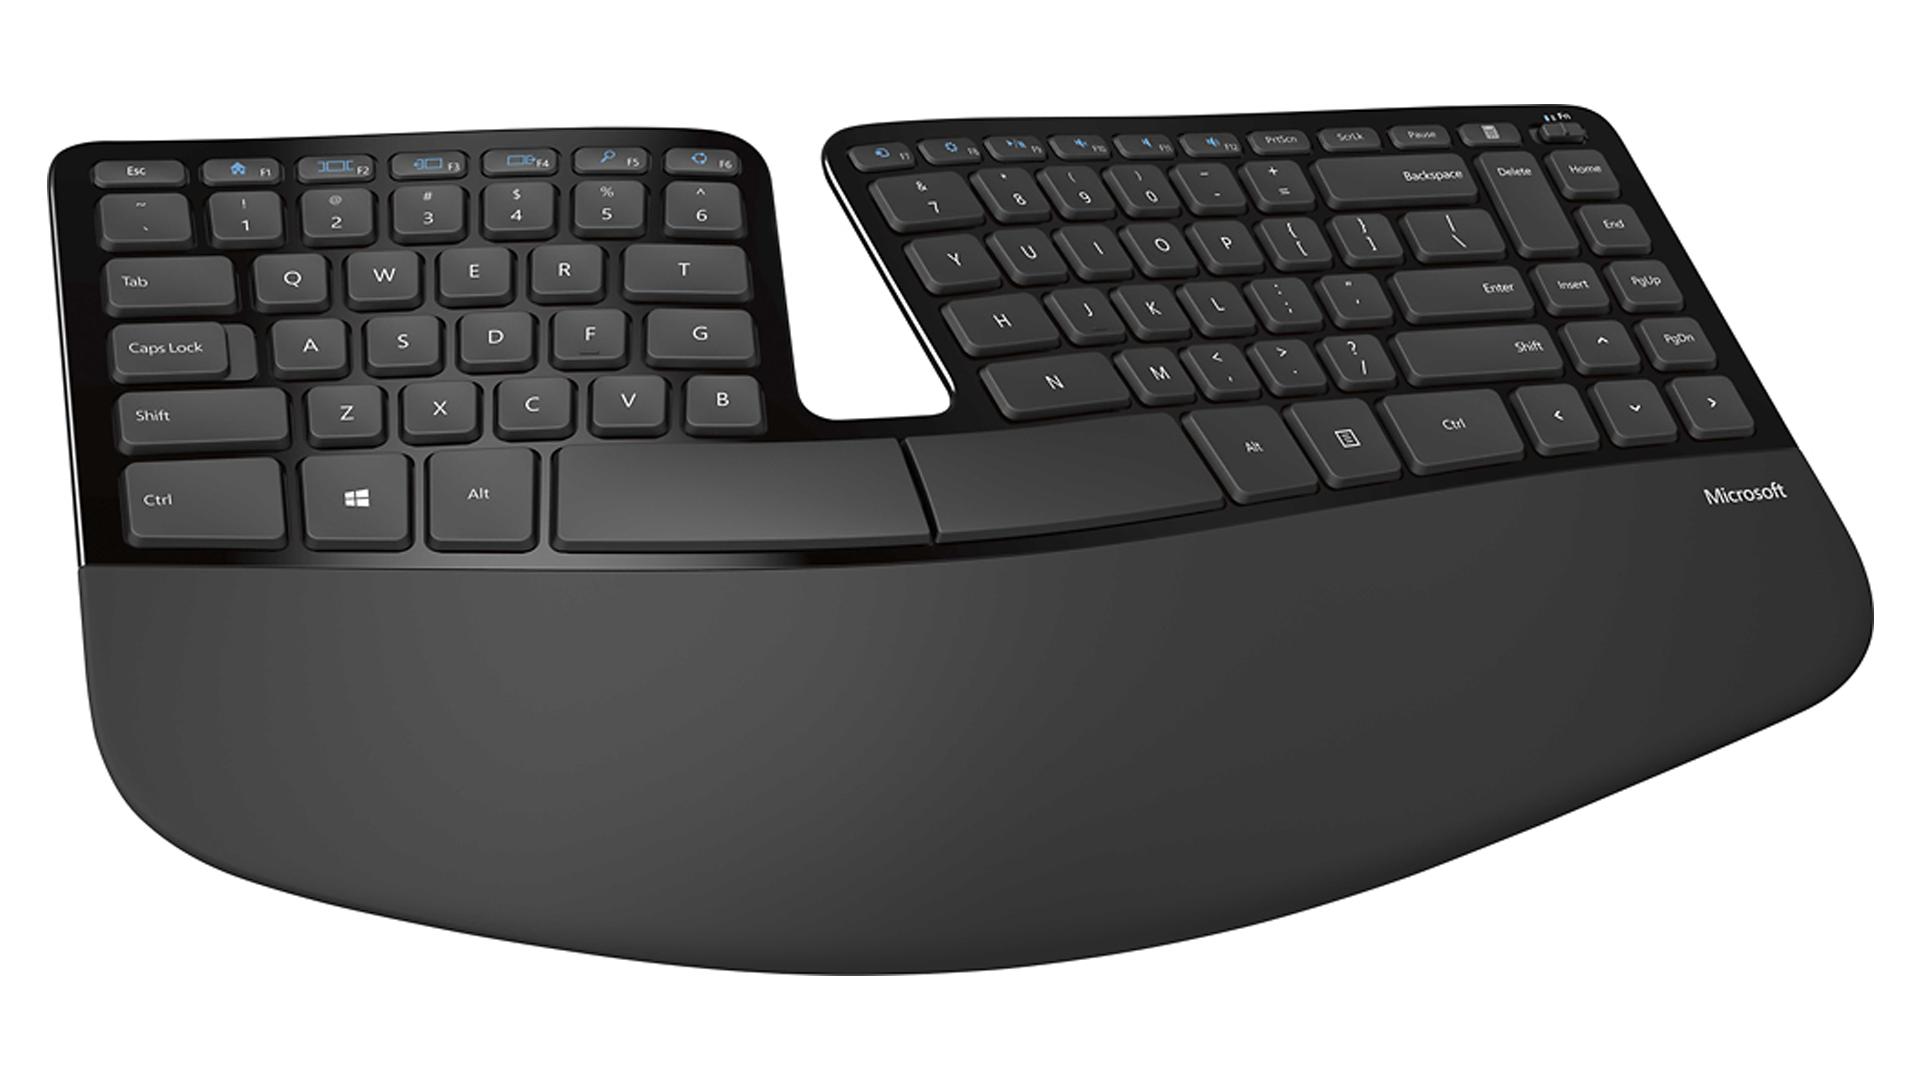 A photo of the Microsoft Sculpt Ergo Keyboard.